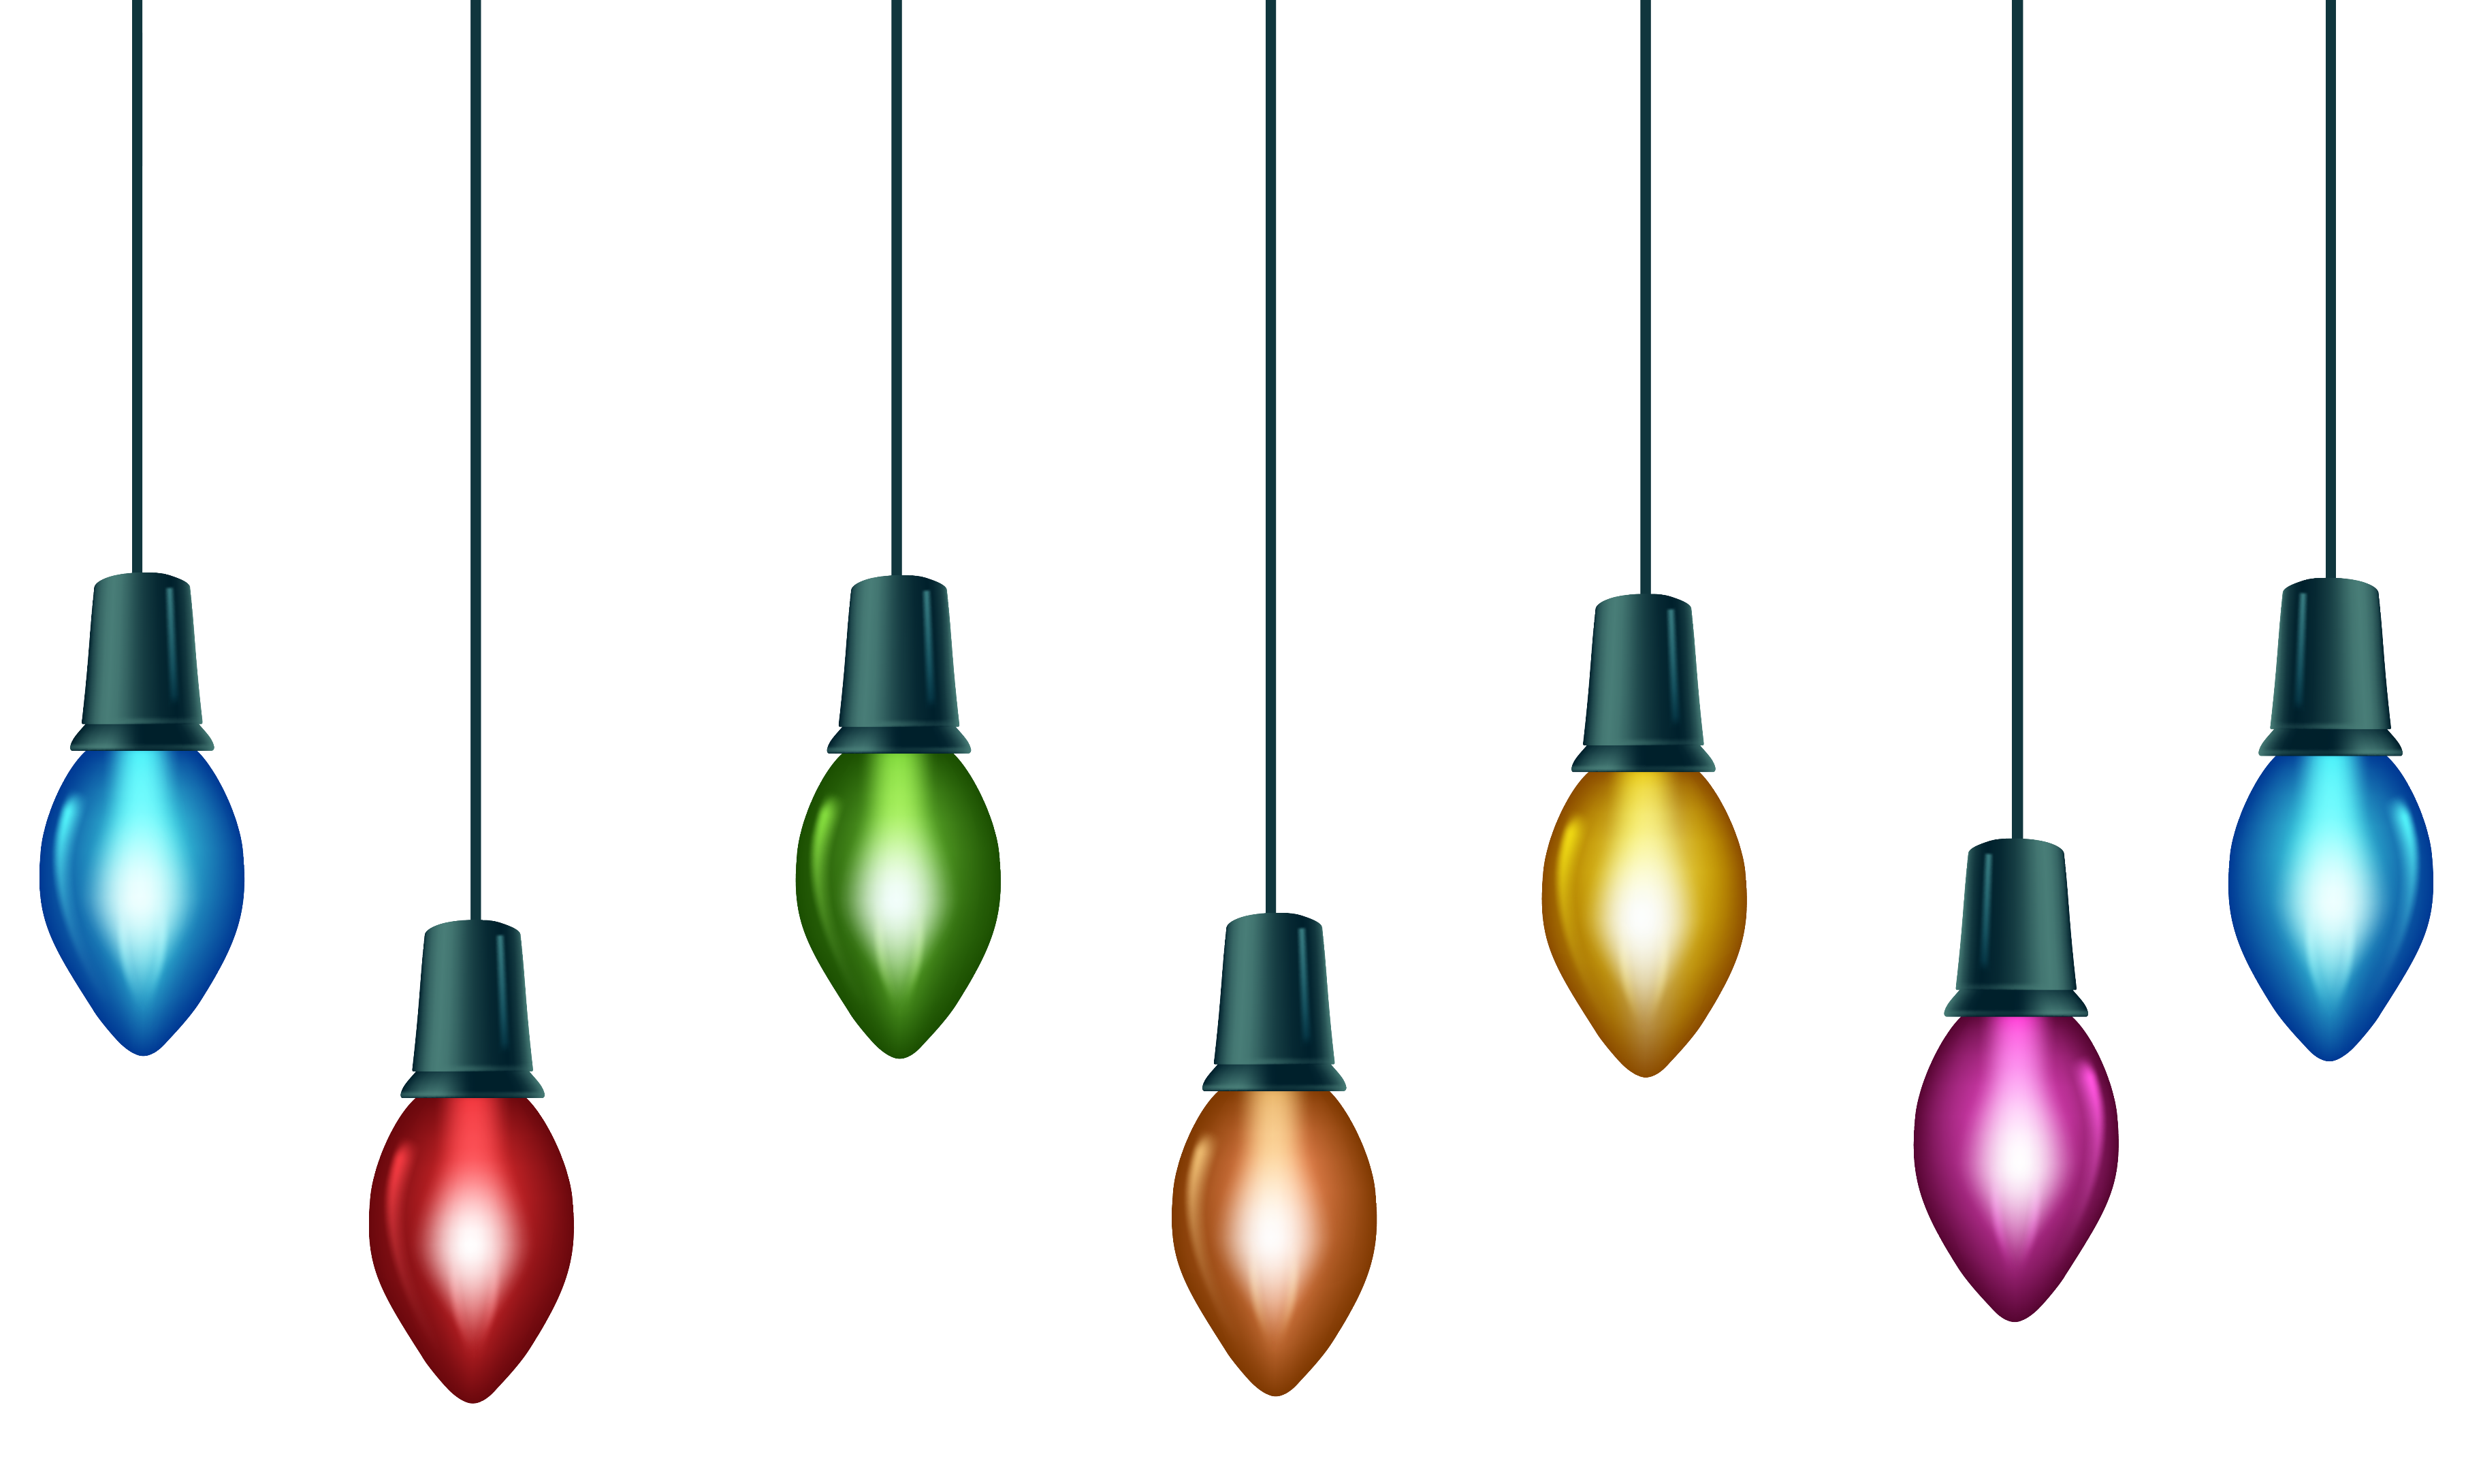 3622x2180 Christmas ~ Christmas Light Bulbs Clipart Free String Of Lights